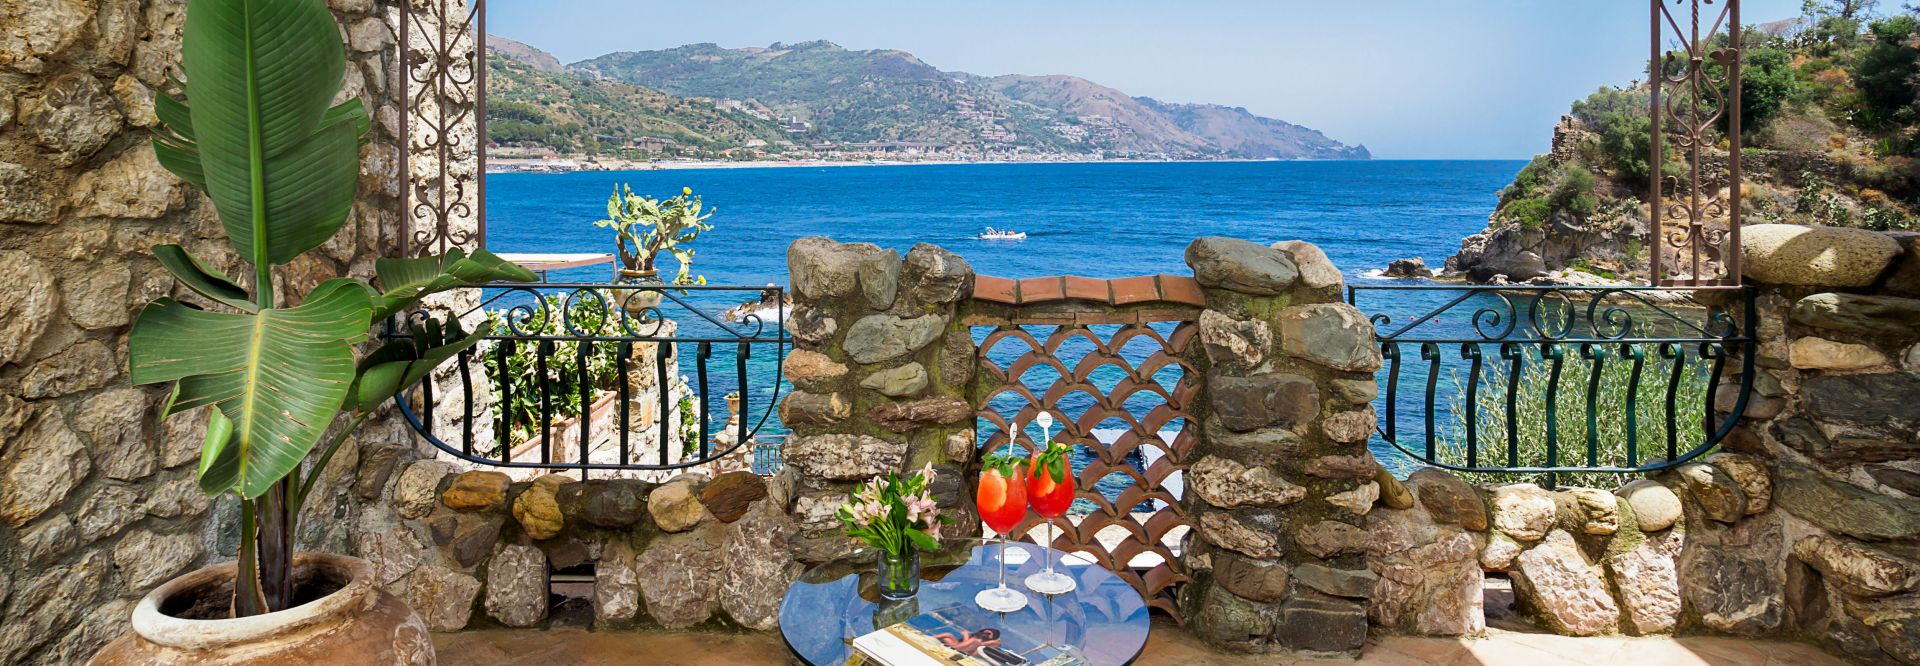 Terrasse des Deluxe Zimmers im Atlantis Bay auf Sizilien (c) Alfio Garozzo (VOI Grand Hotel Atlantis Bay)